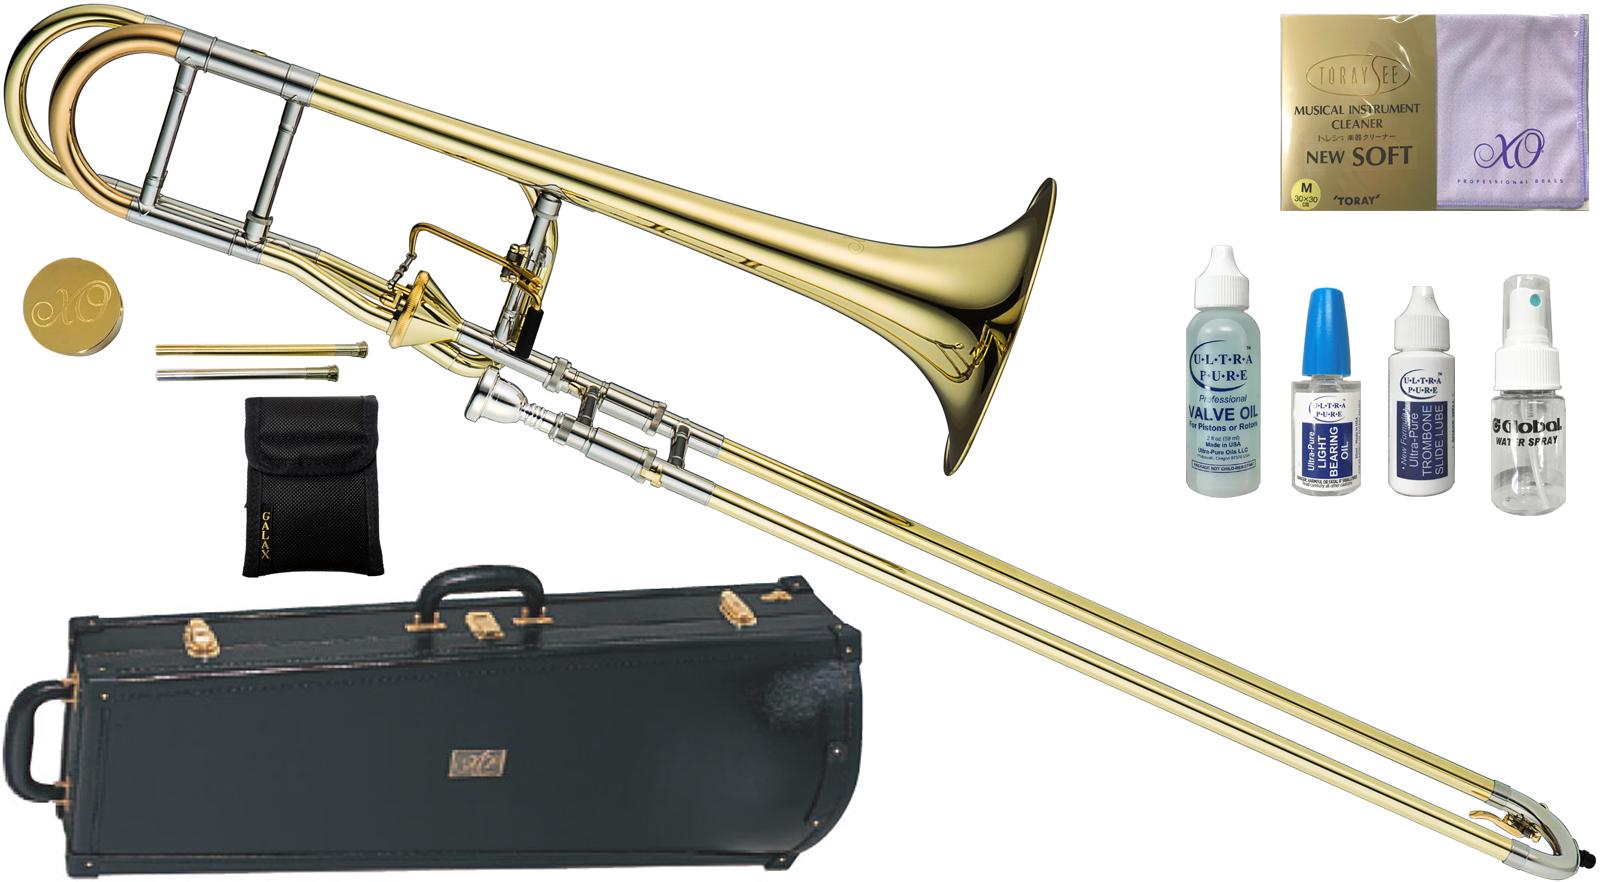 XO ( B♭/F管 エックスオー Trombones BT-L ) 1236L-T トロンボーン 新品 B♭/F管 テナーバストロンボーン アキシャルフローバルブ イエローブラス 太管 Tenor Bass Trombones BT-L 送料無料, 腕時計のセレクトショップカプセル:1e4ef4ea --- officewill.xsrv.jp